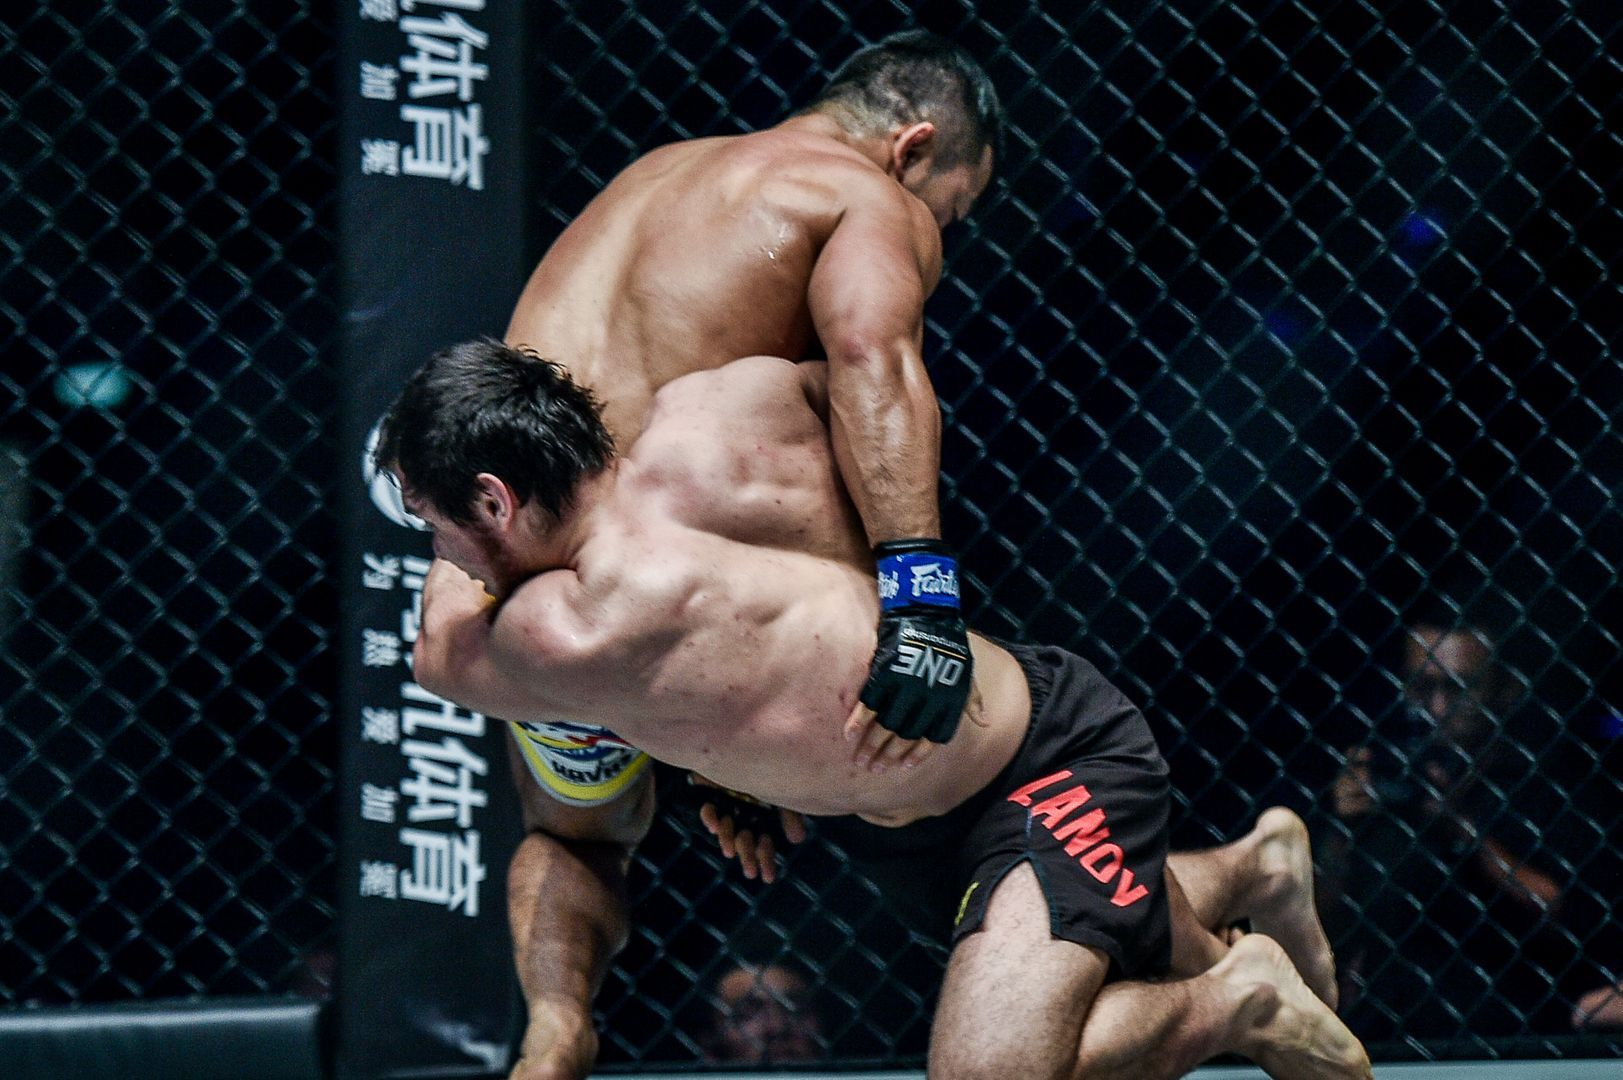 Murad Ramazanov scores a takedown on Bae Myung Ho